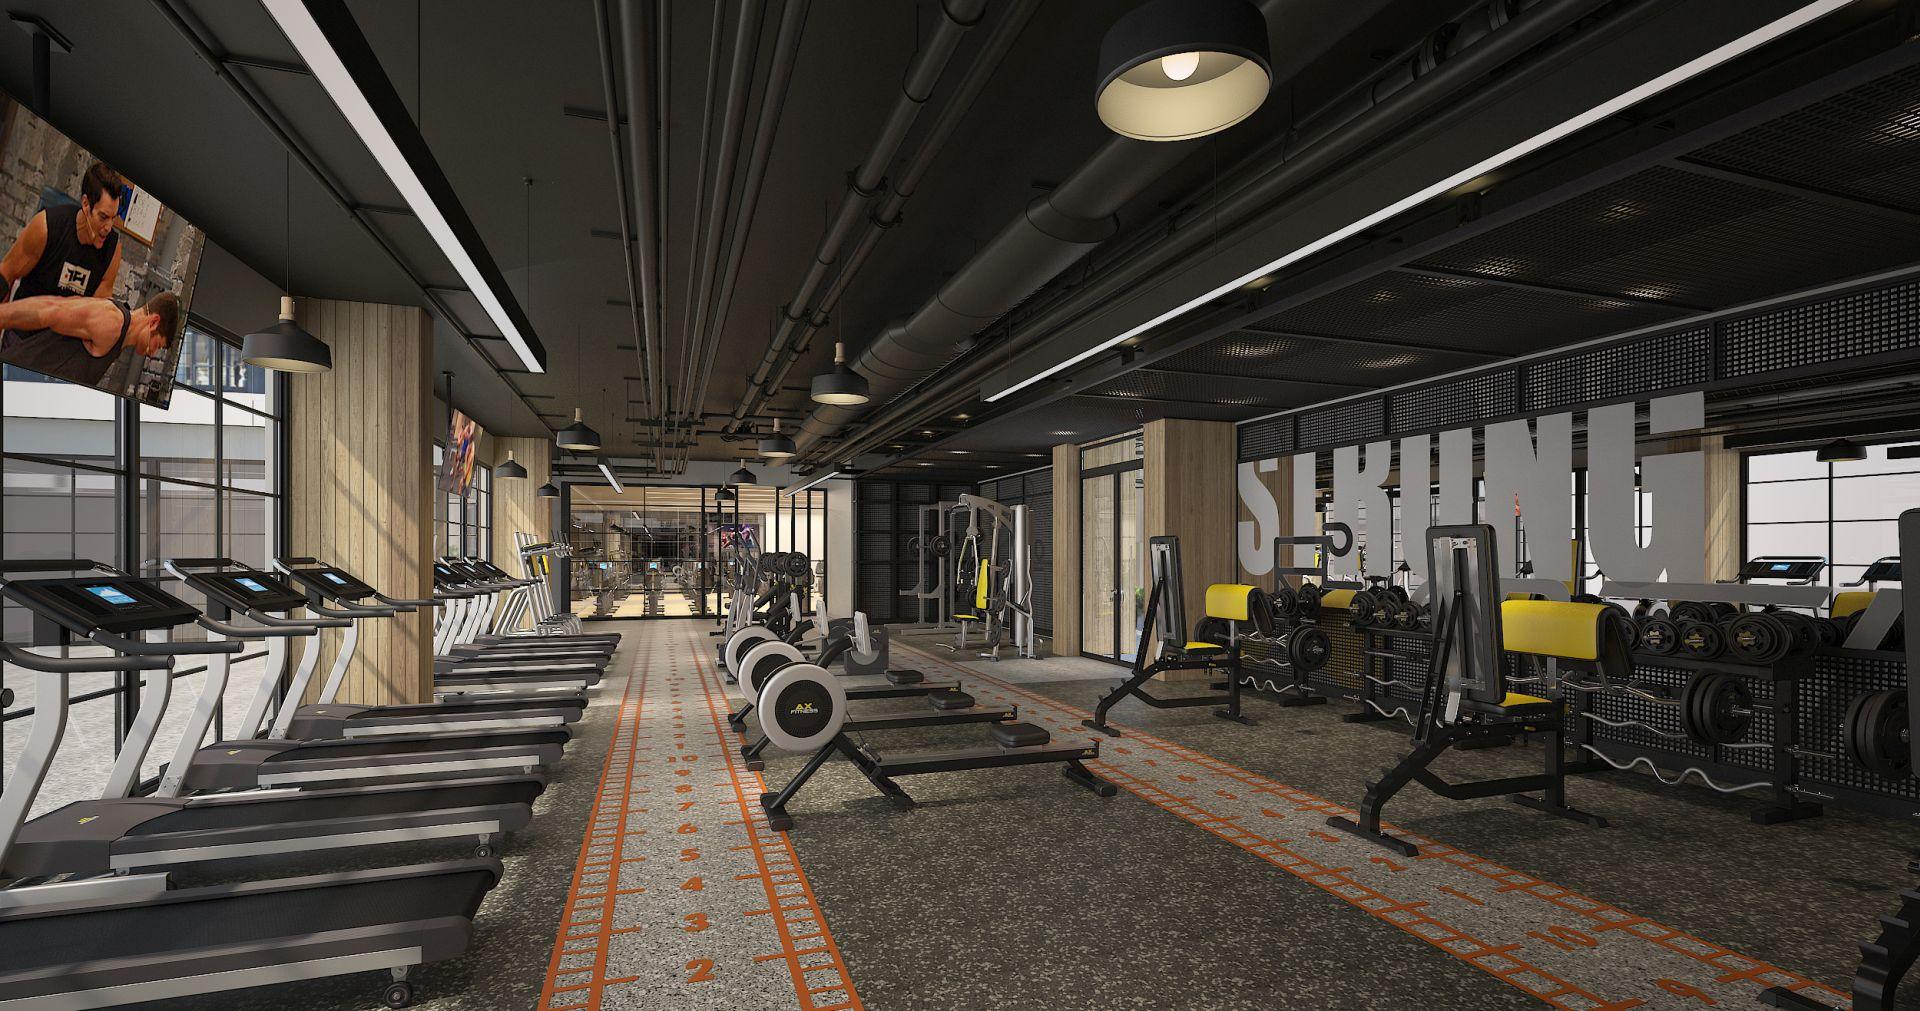 Wynwood 25 fitness center